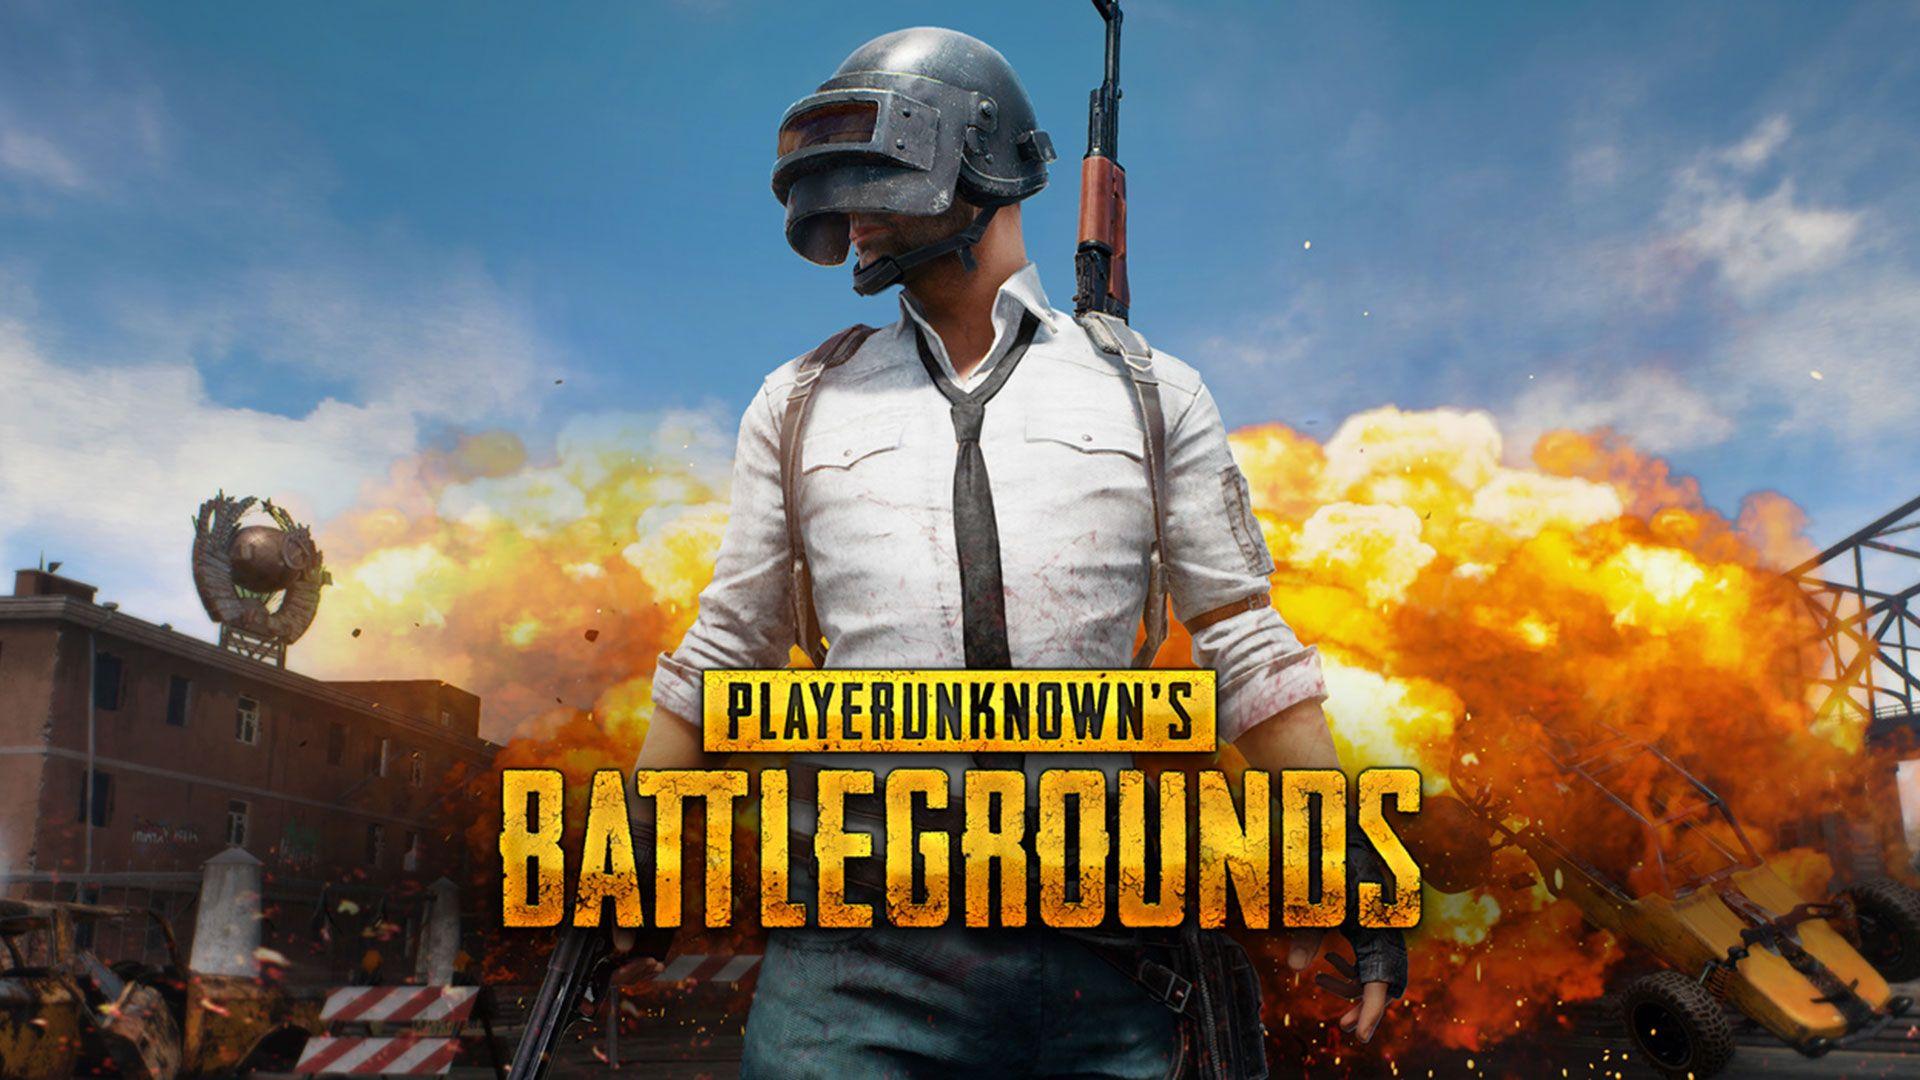 Inside Xbox   قابلیت بازی میان پلتفرمی PUBG میان پلیاستیشن ۴ و اکسباکس وان به زودی در دسترس قرار خواهد گرفت